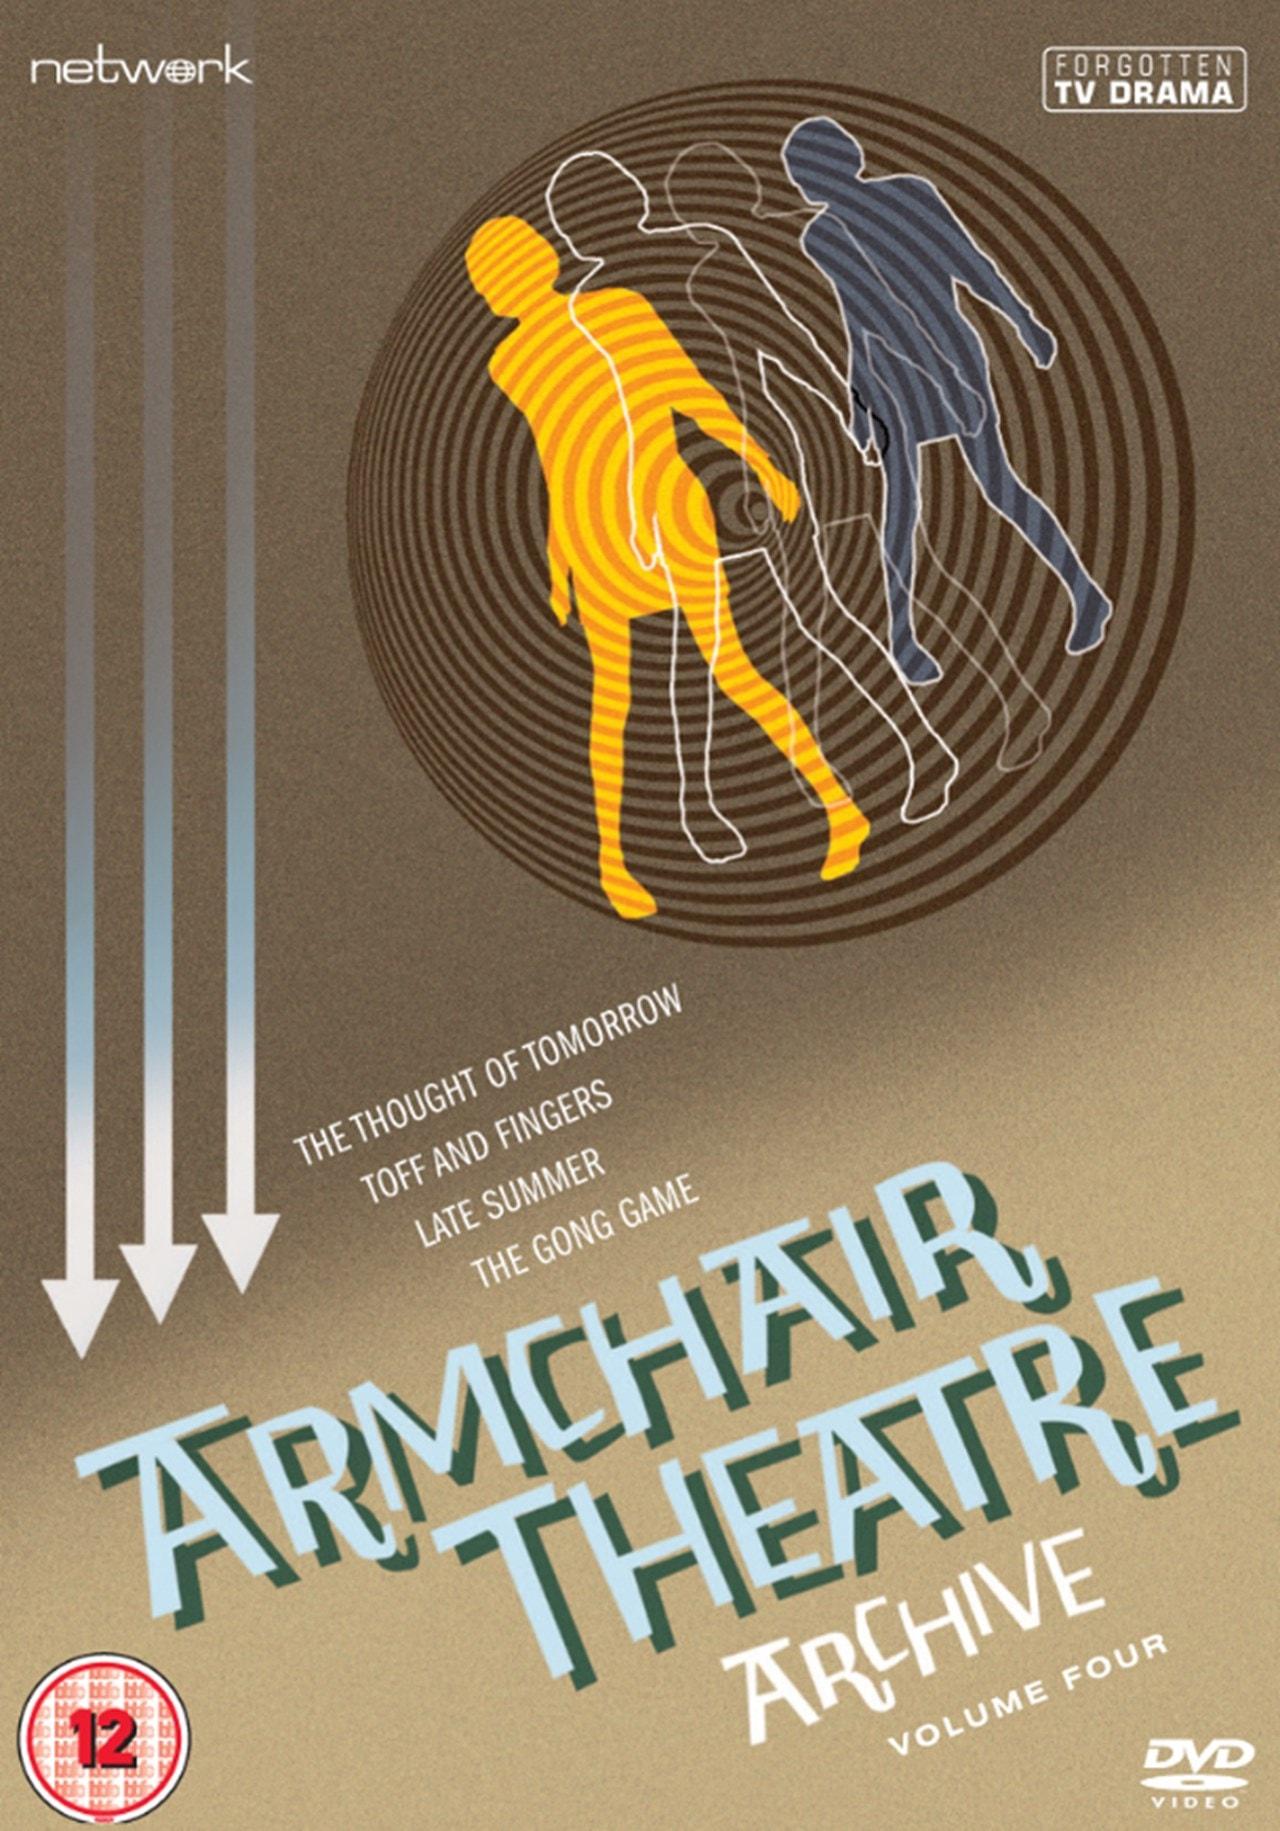 Armchair Theatre Archive: Volume 4 - 1